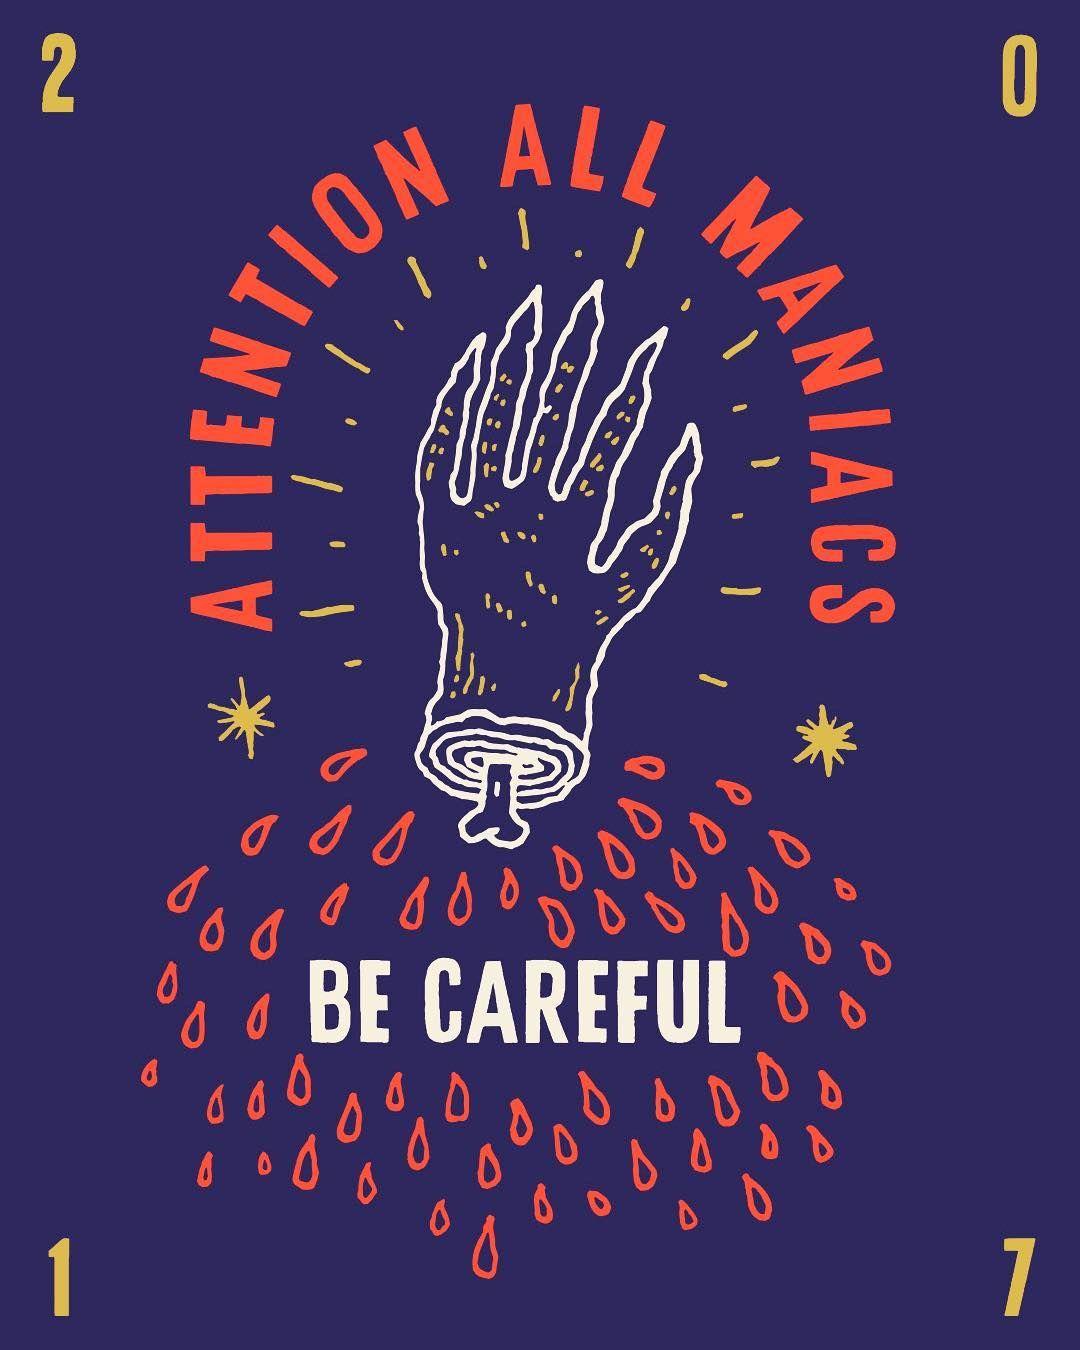 Watch yourself, be careful